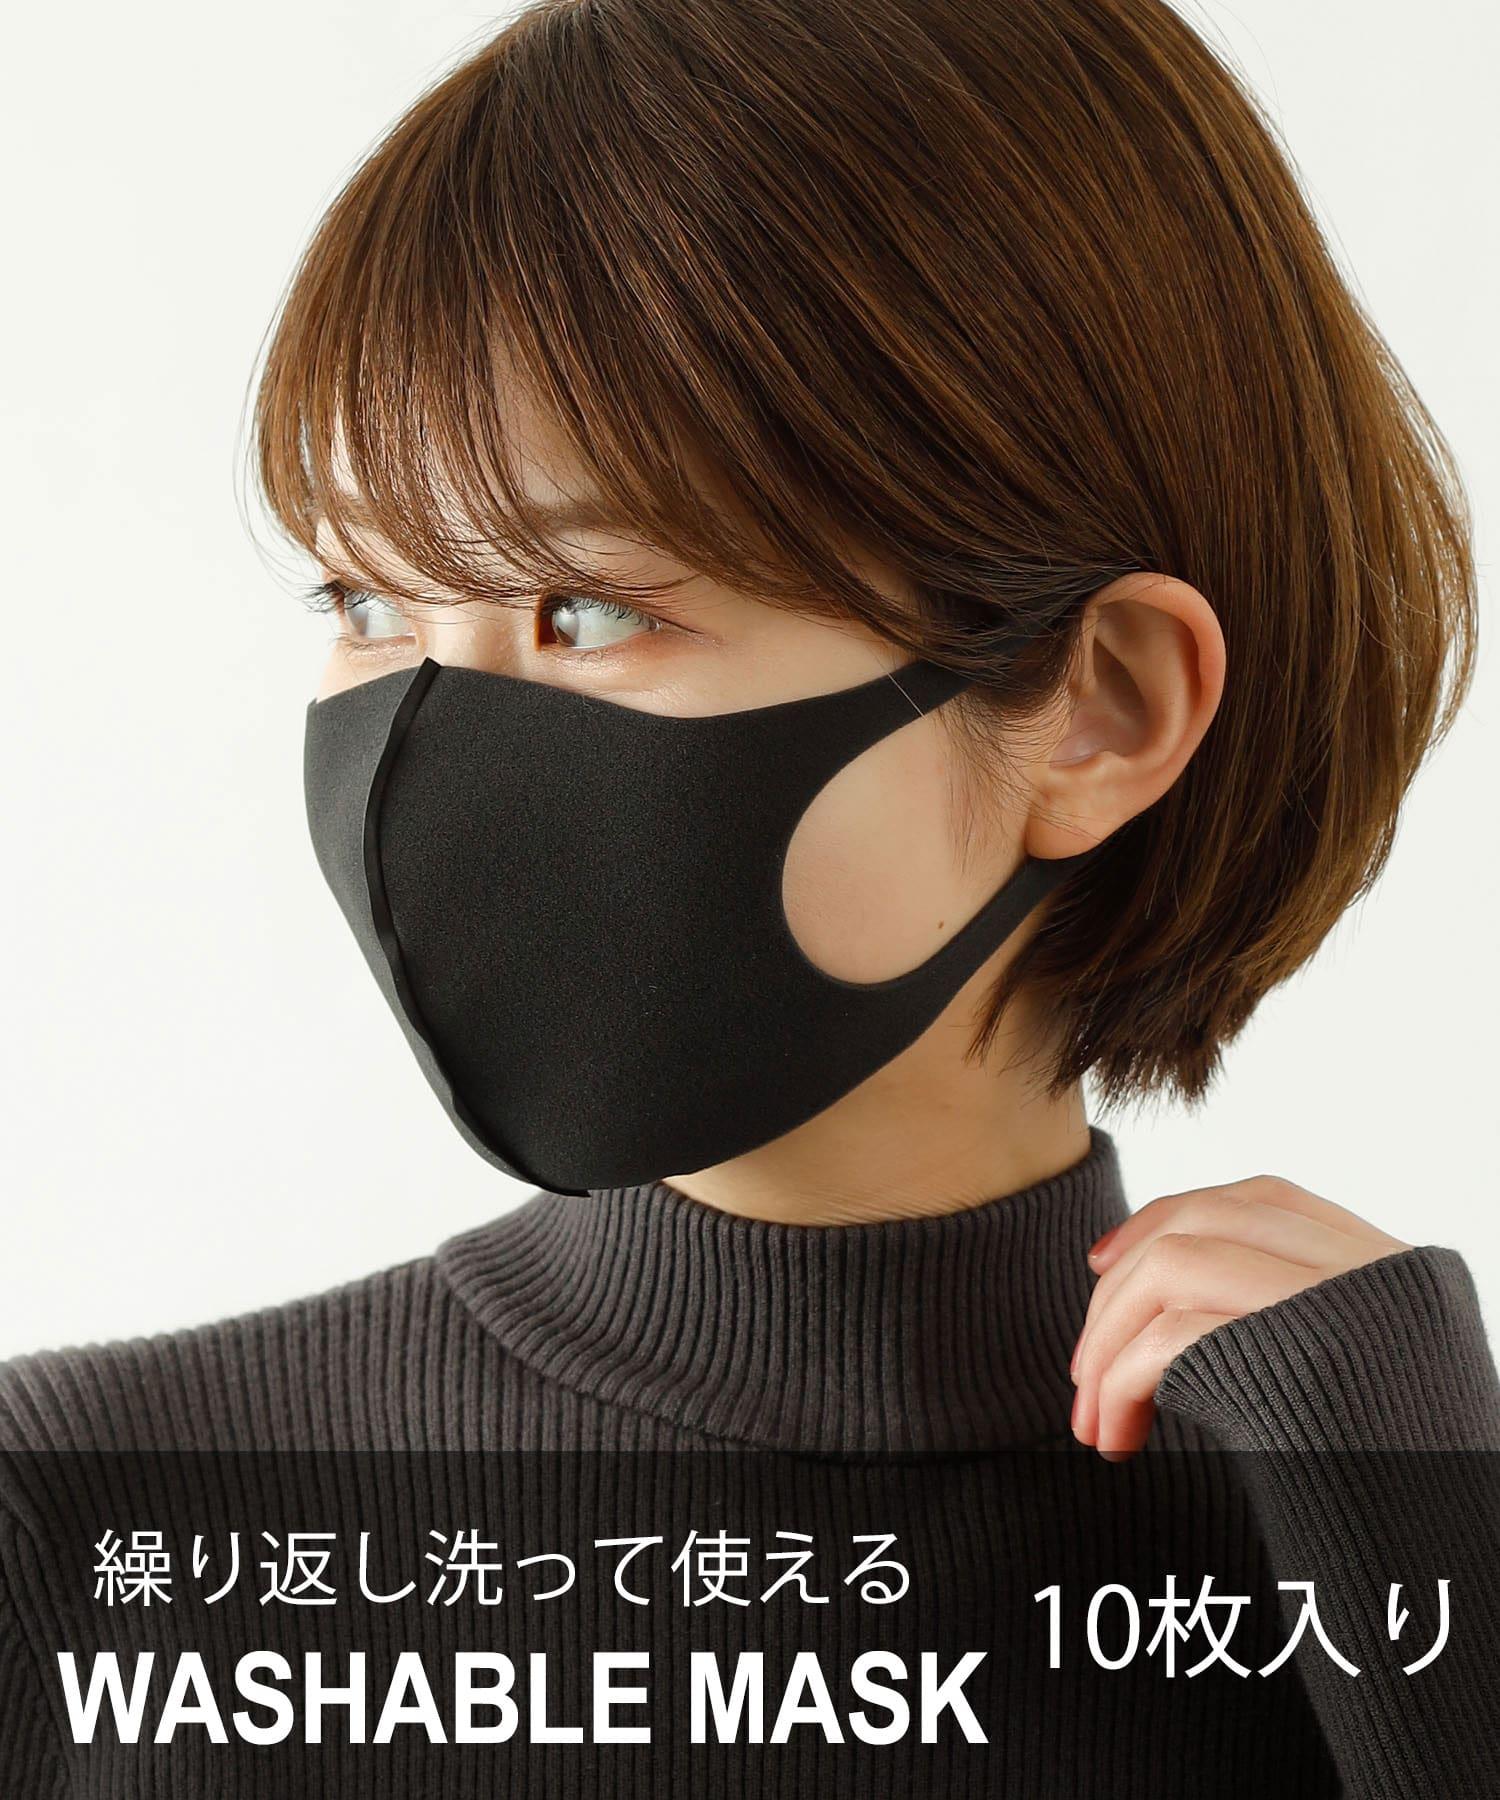 COLONY 2139(コロニー トゥーワンスリーナイン) ライフスタイル 【10枚セット】ウォッシャブルマスク/洗えるマスク ブラック